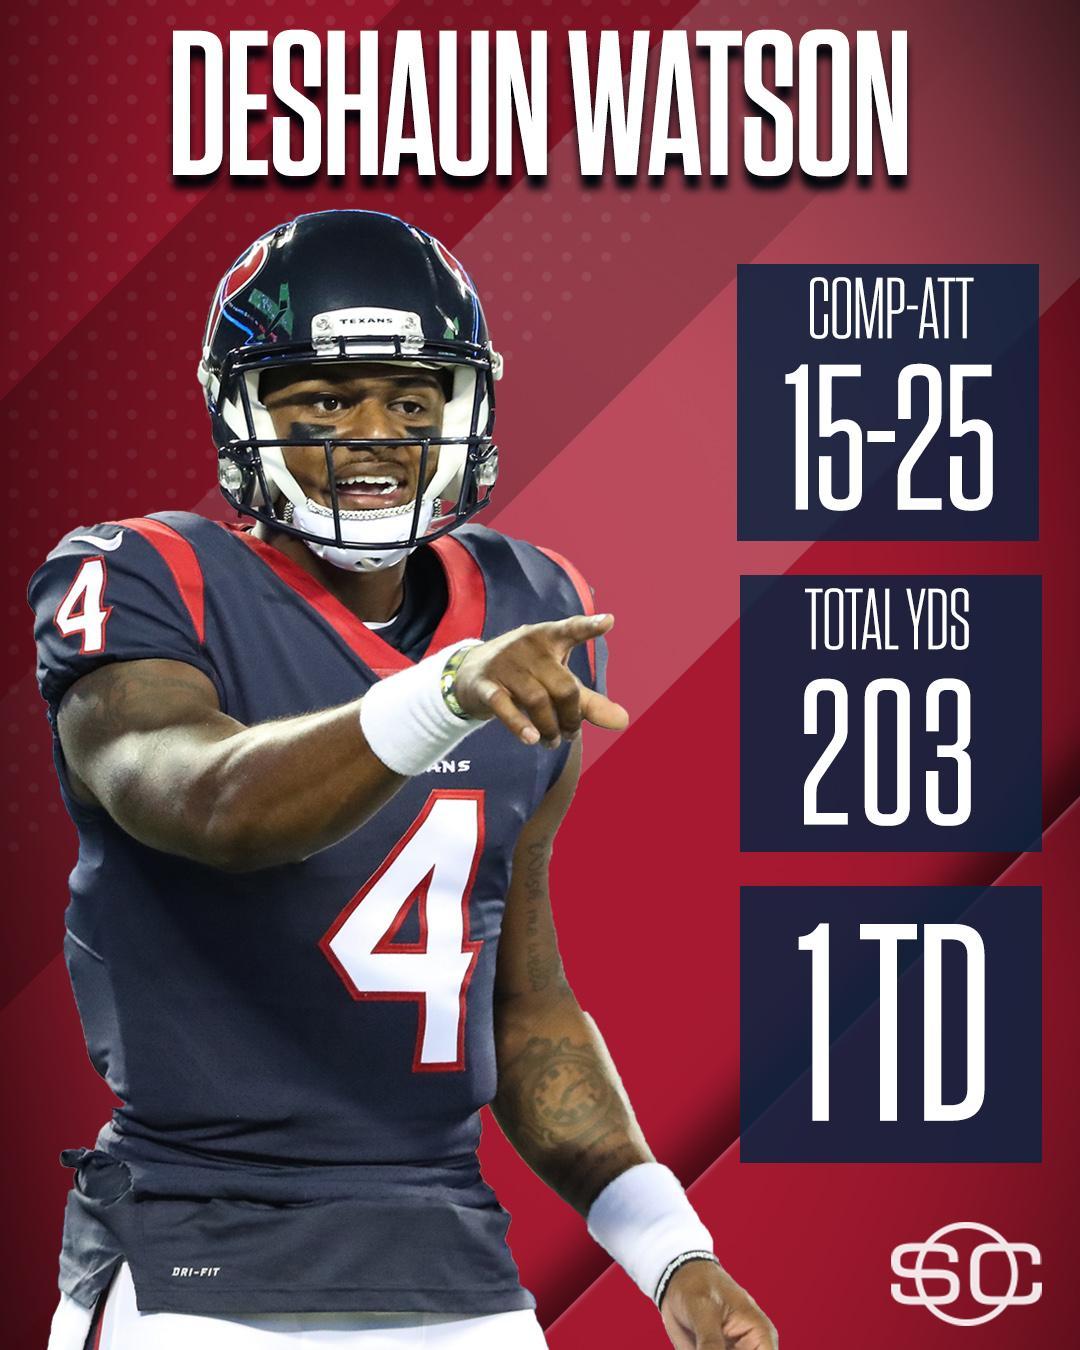 Deshaun Watson looked good in his Texans debut. https://t.co/l3Ojapjb9n